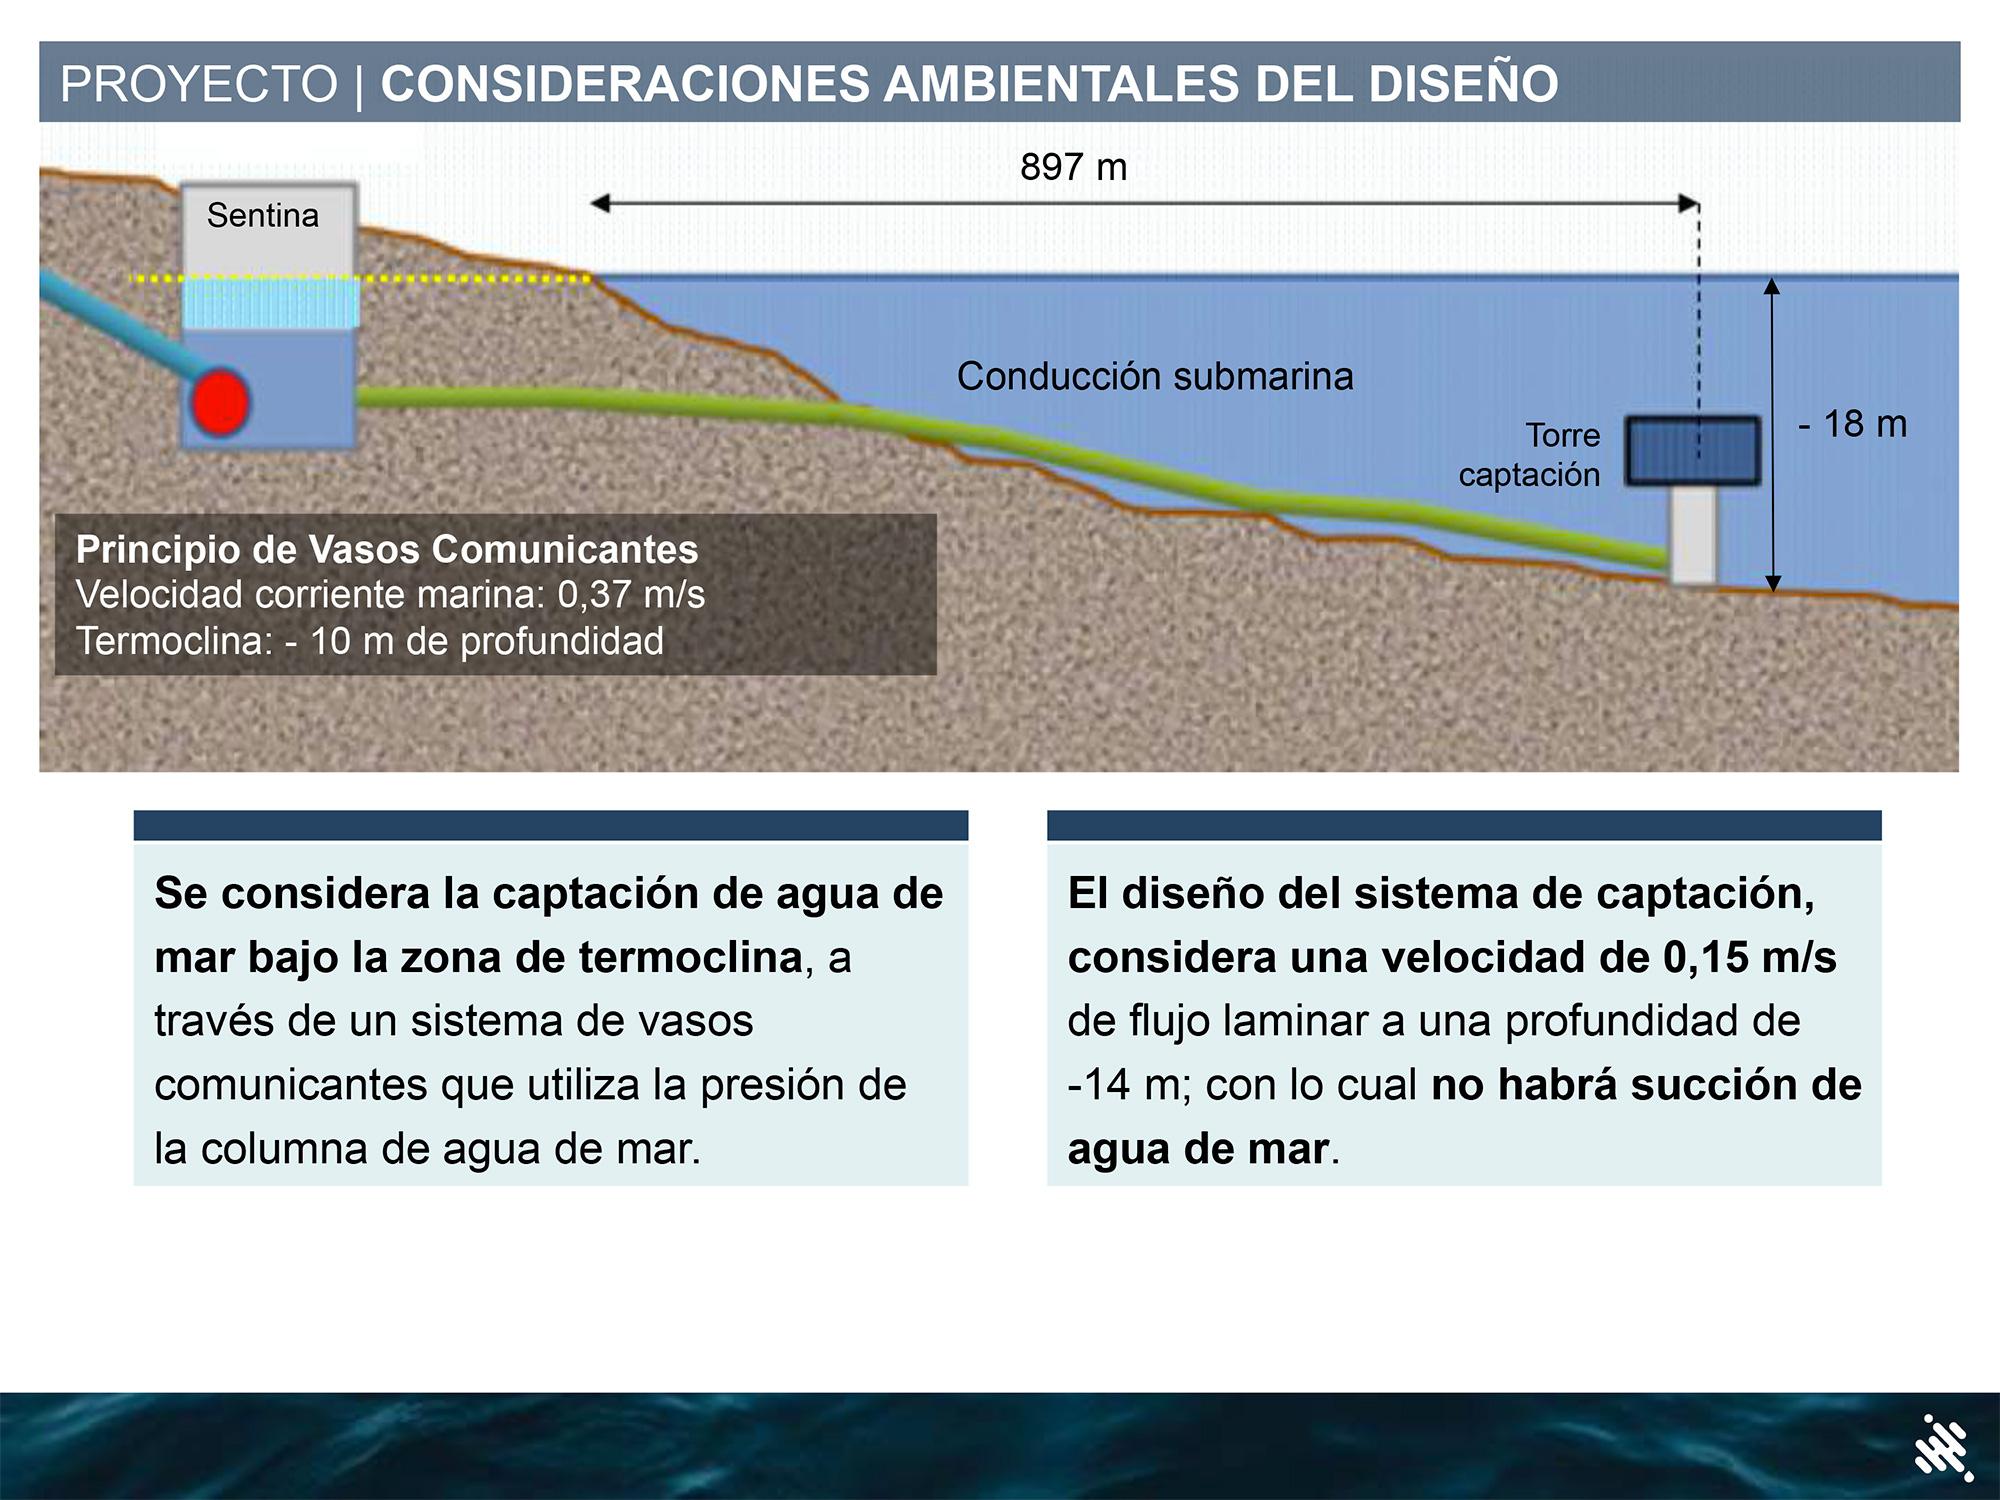 AP_Proyecto_Aconcagua-15.jpg